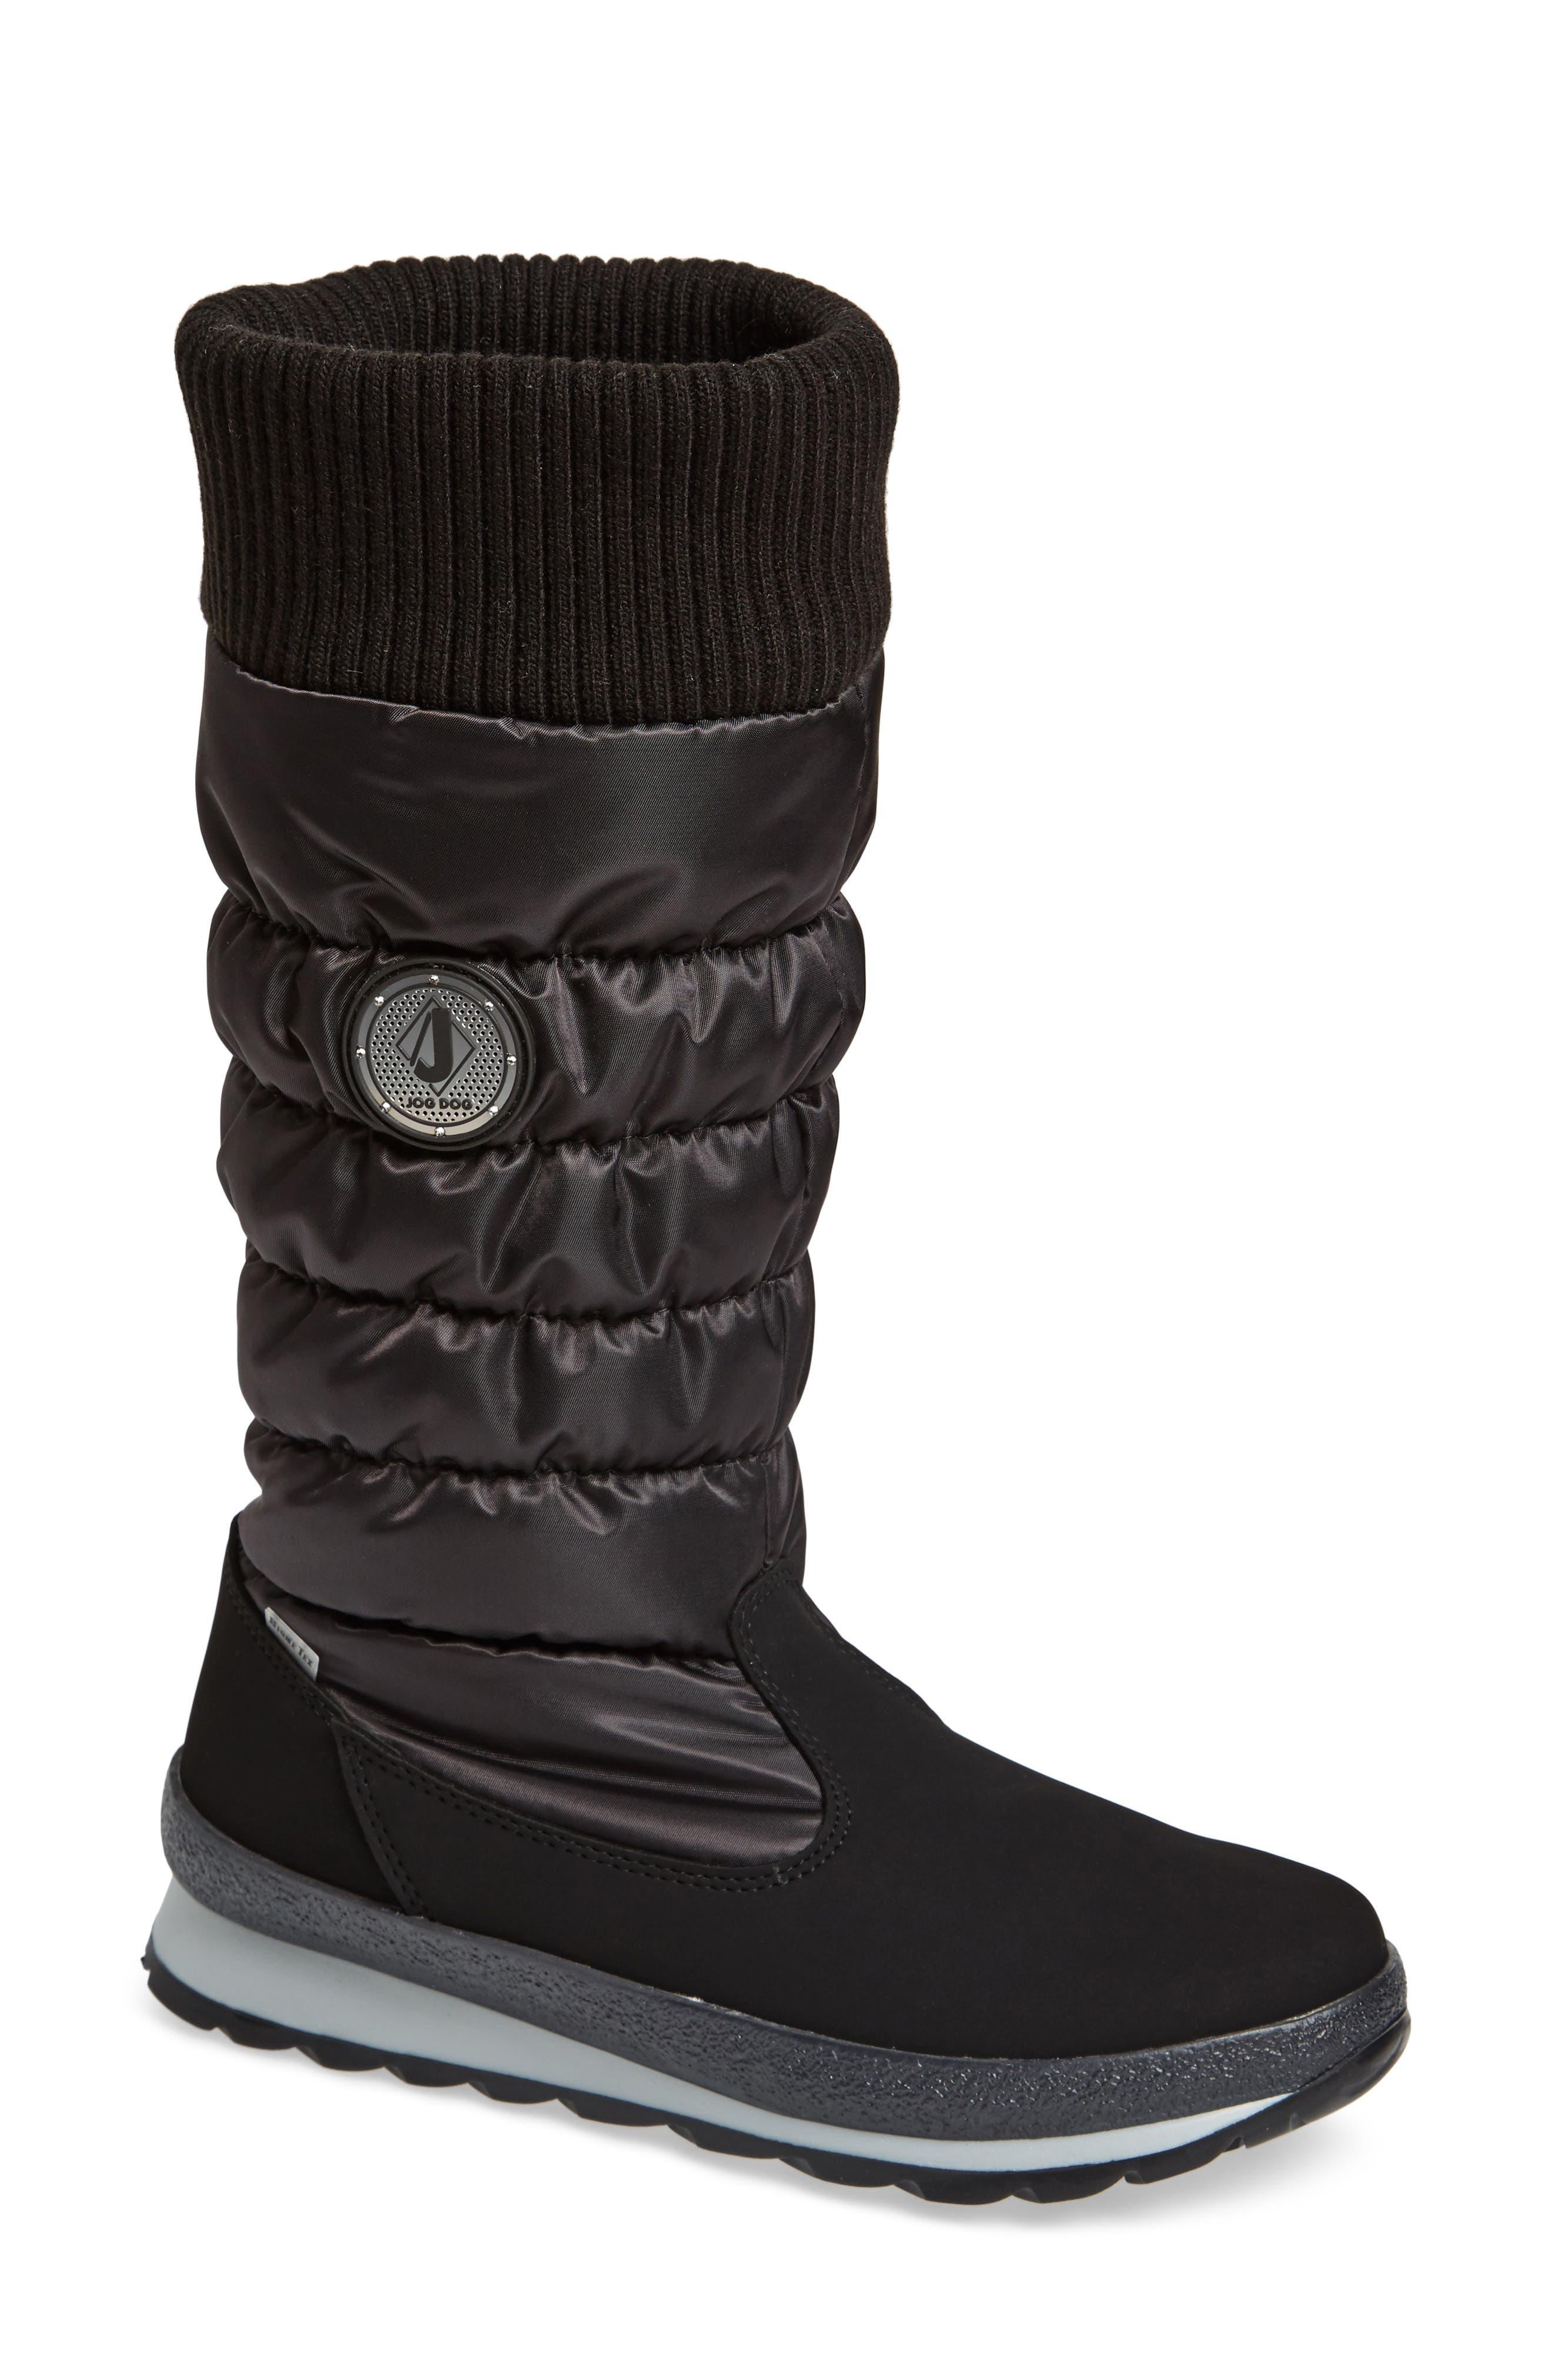 St. Anton Waterproof Winter Boot,                         Main,                         color, BLACK/ ANTHRACITE